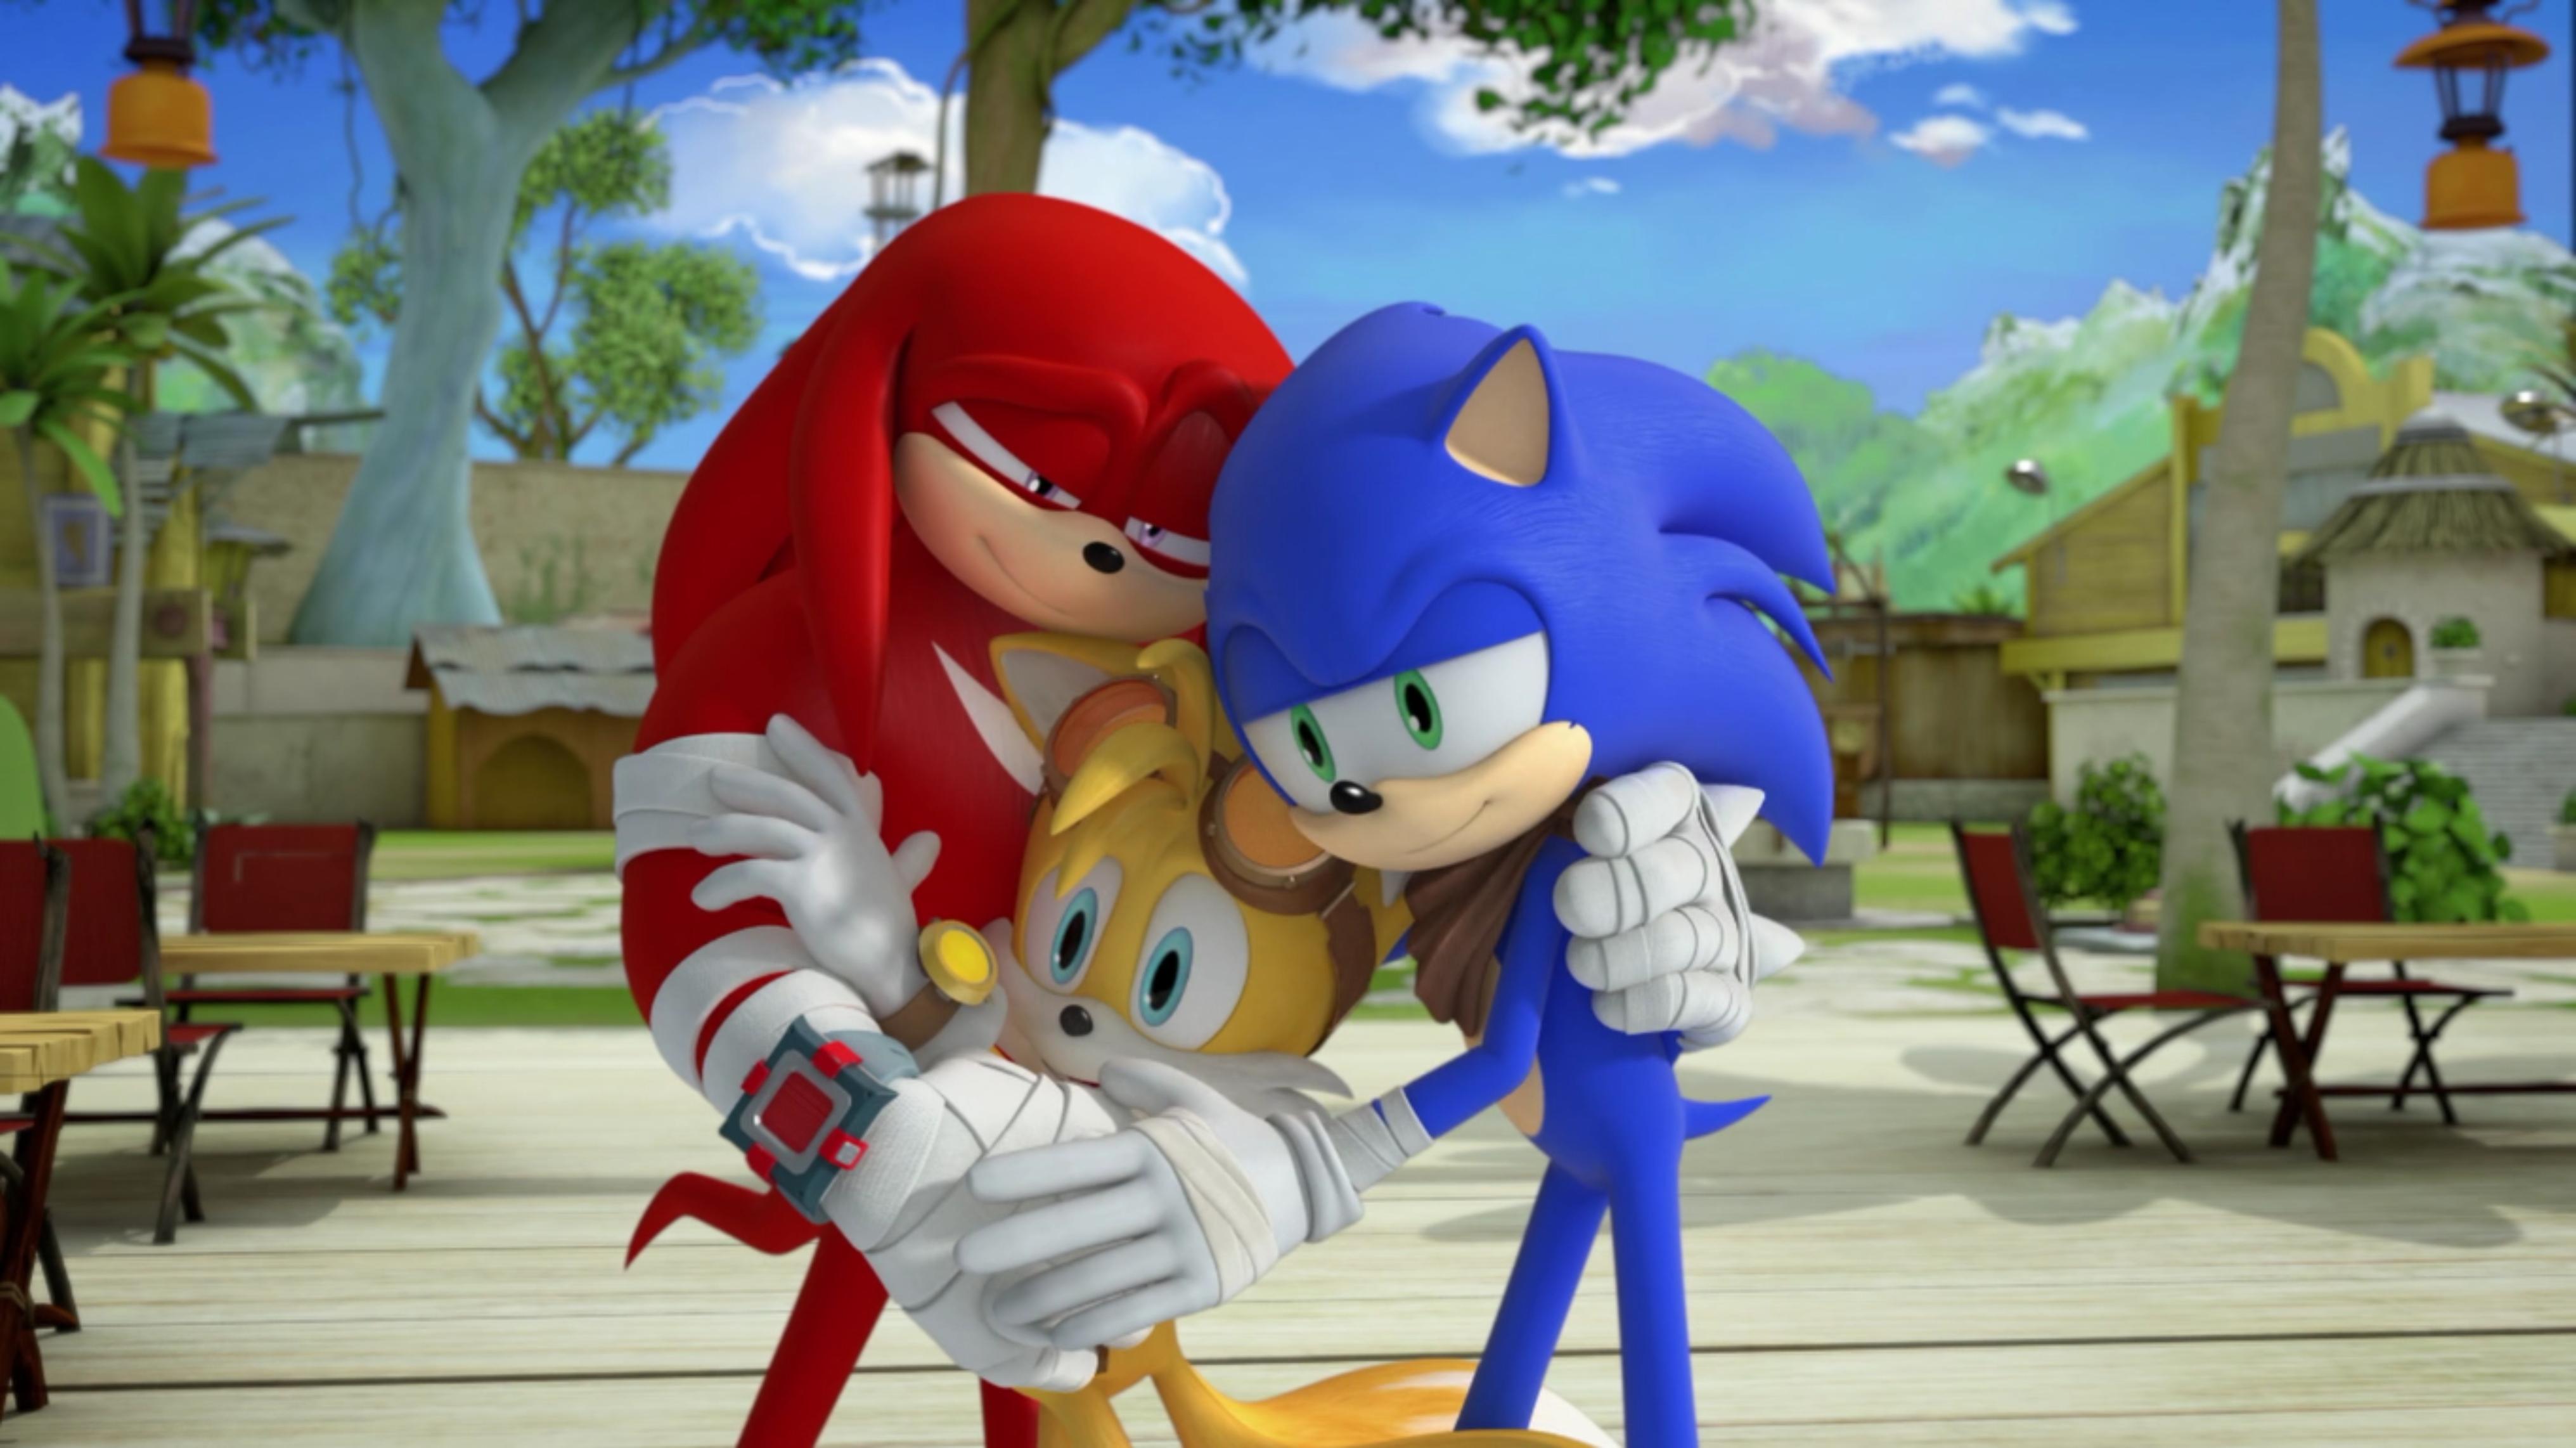 Imagenes De Sonic Para Imprimir: Background 4 PNG Imagens E Moldes